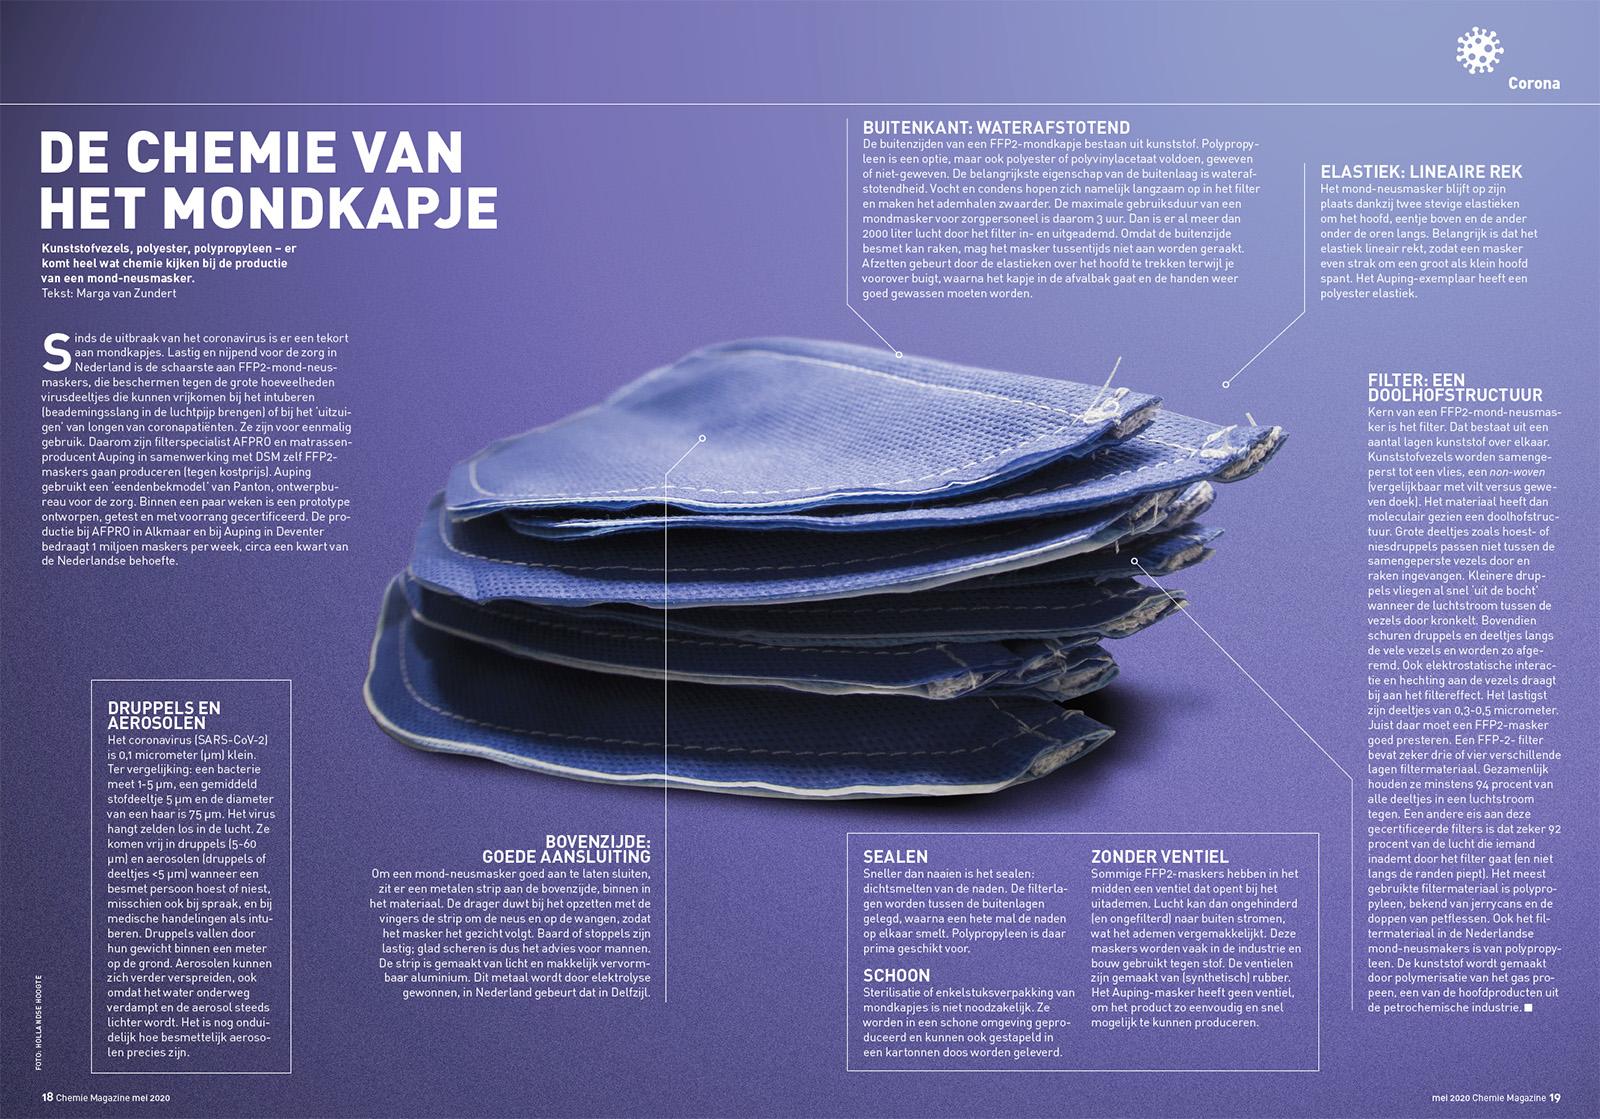 https://assets.vnci.nl/p/32768/Mondkapje_chemie.jpg